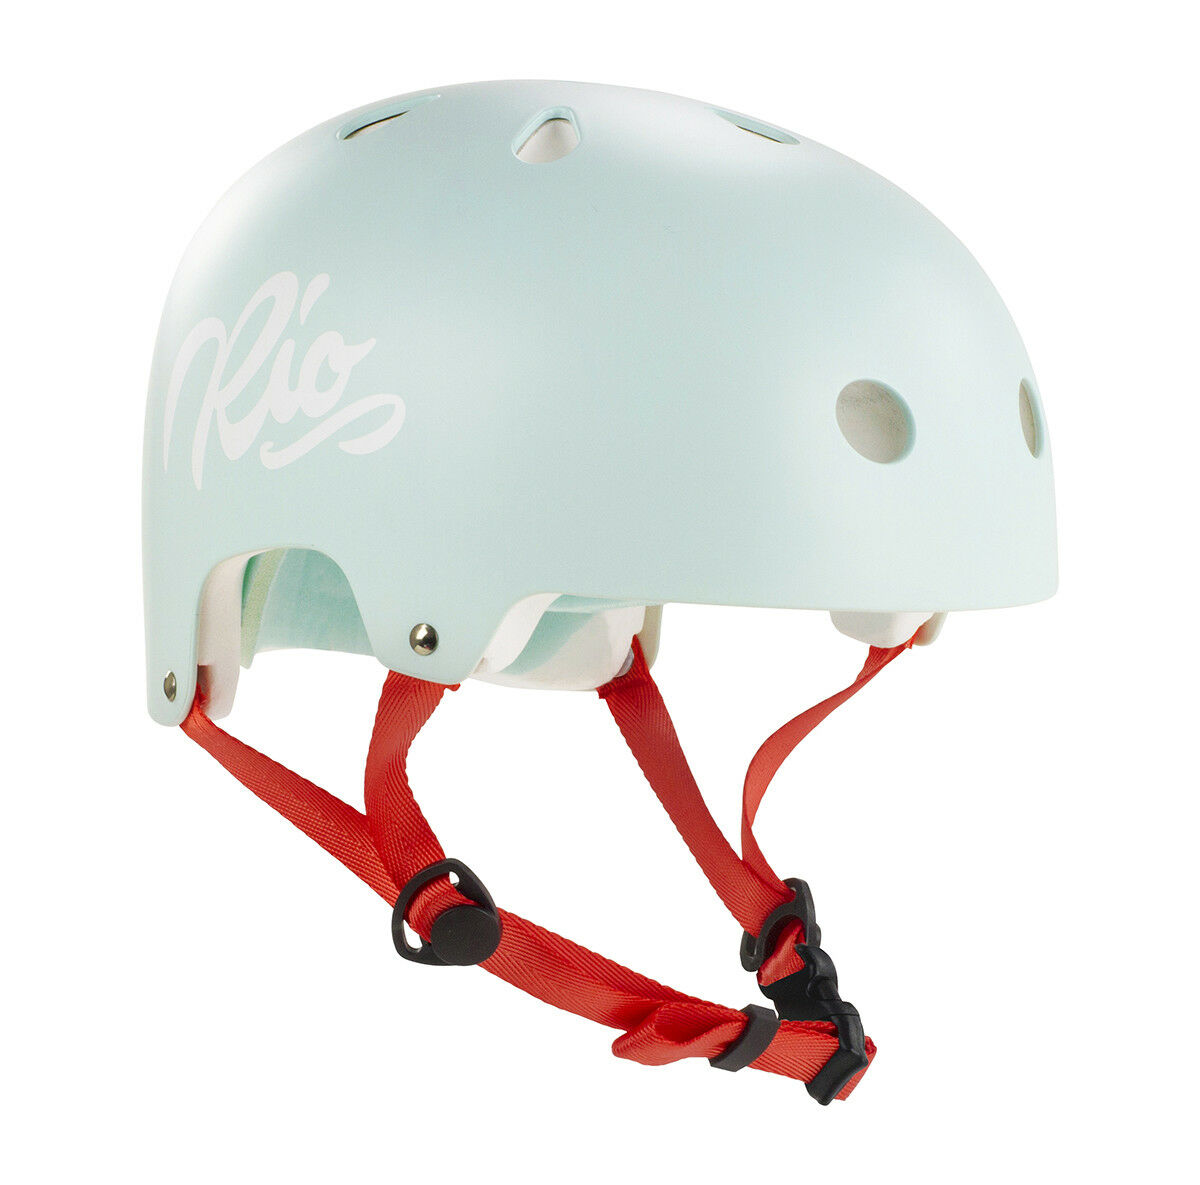 Rio Roller Roller Roller Schriftzug Skating Helm - türkis 615ceb